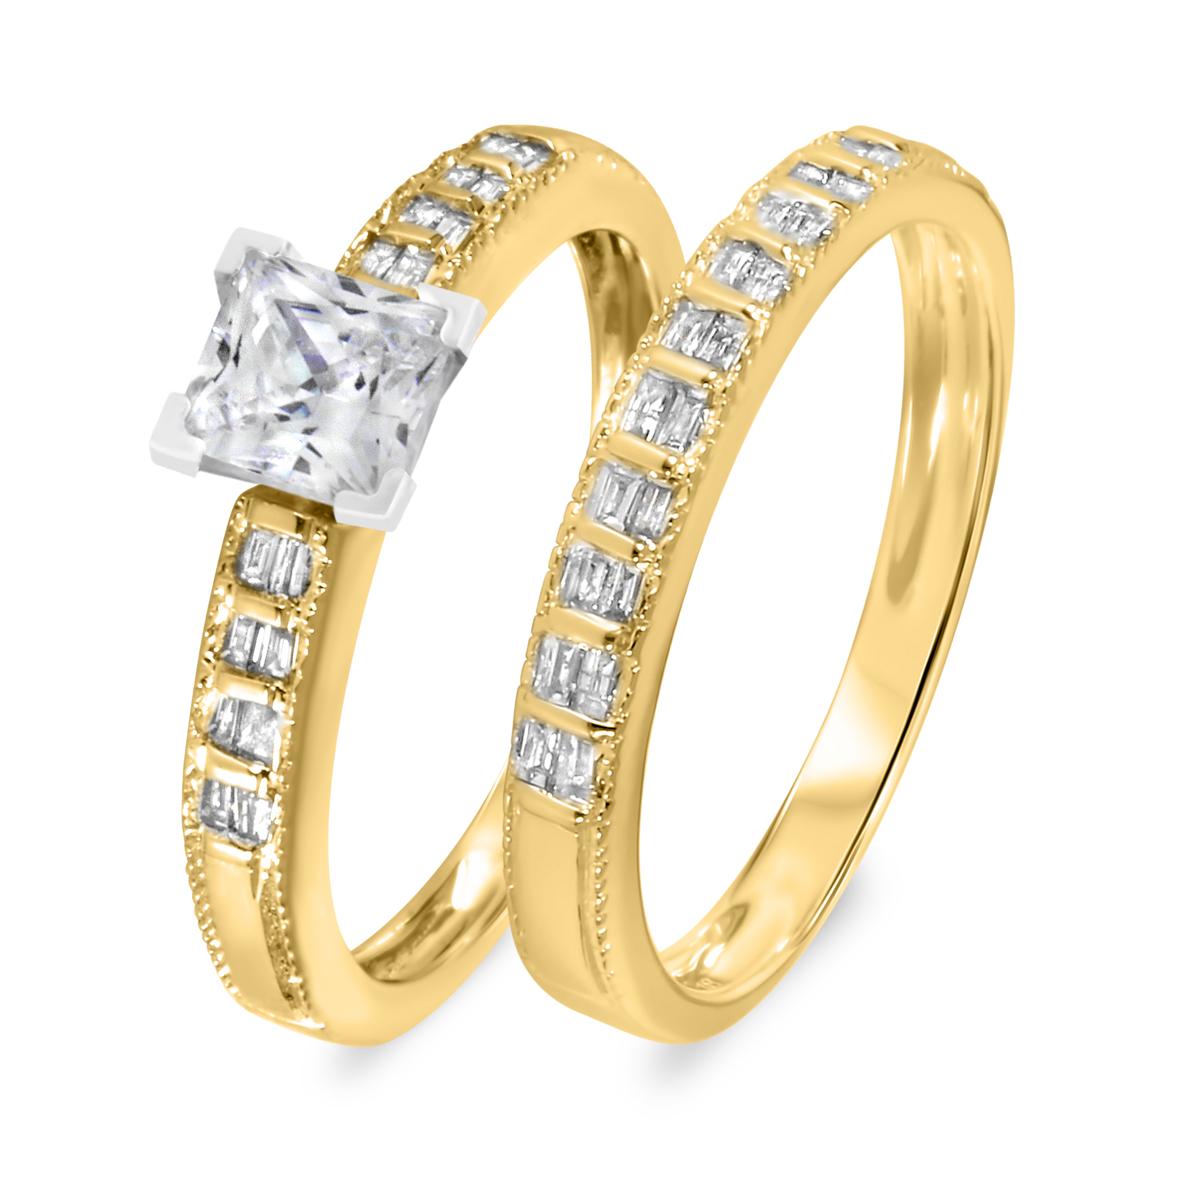 1 1/3 CT. T.W. Diamond Women's Bridal Wedding Ring Set 10K Yellow Gold